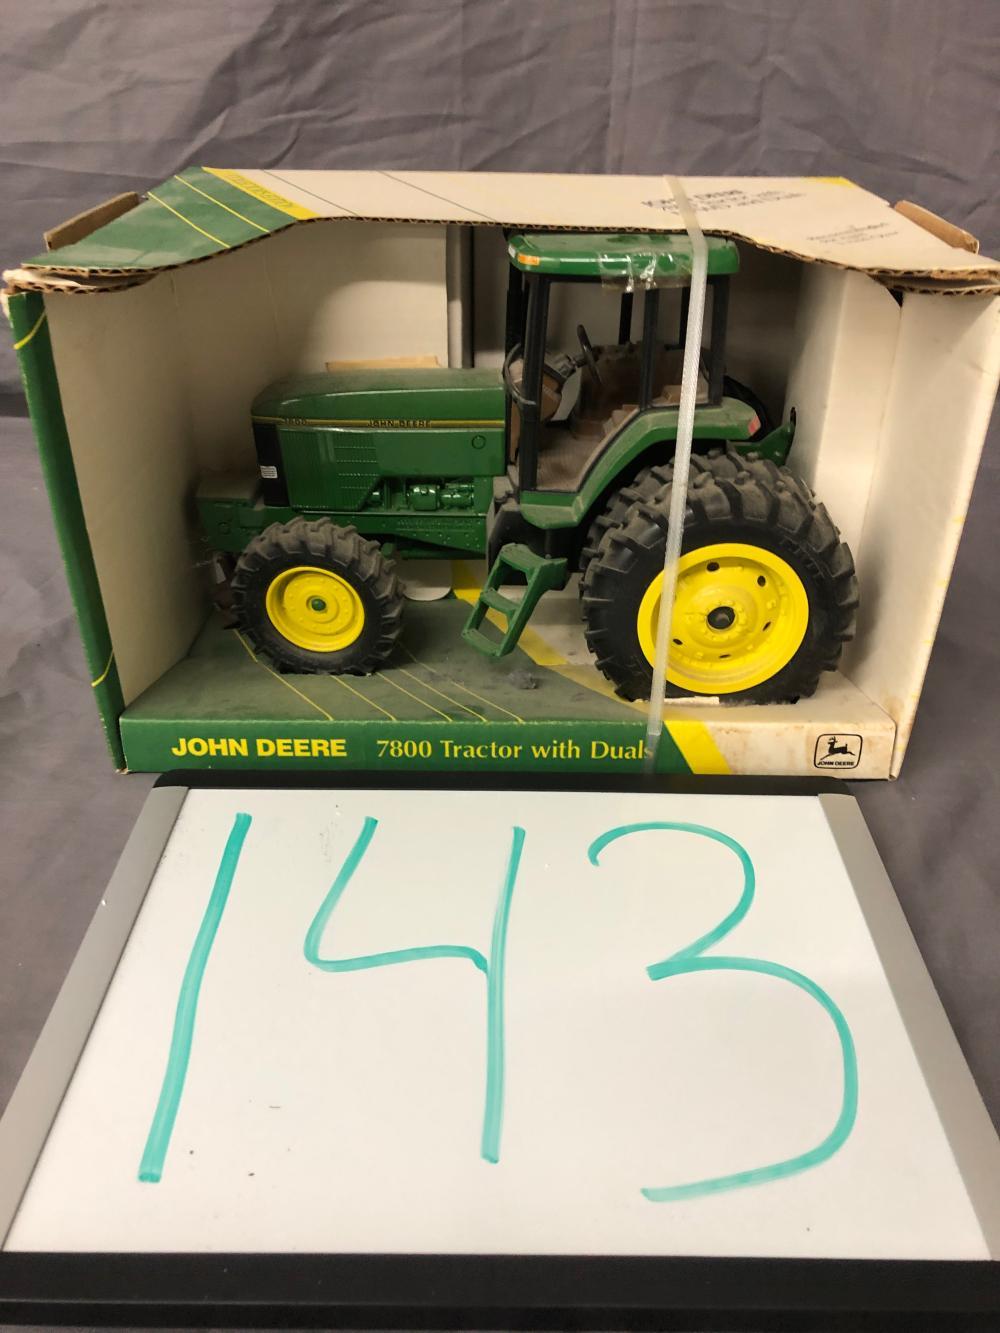 1/16th Scale John Deere 7800